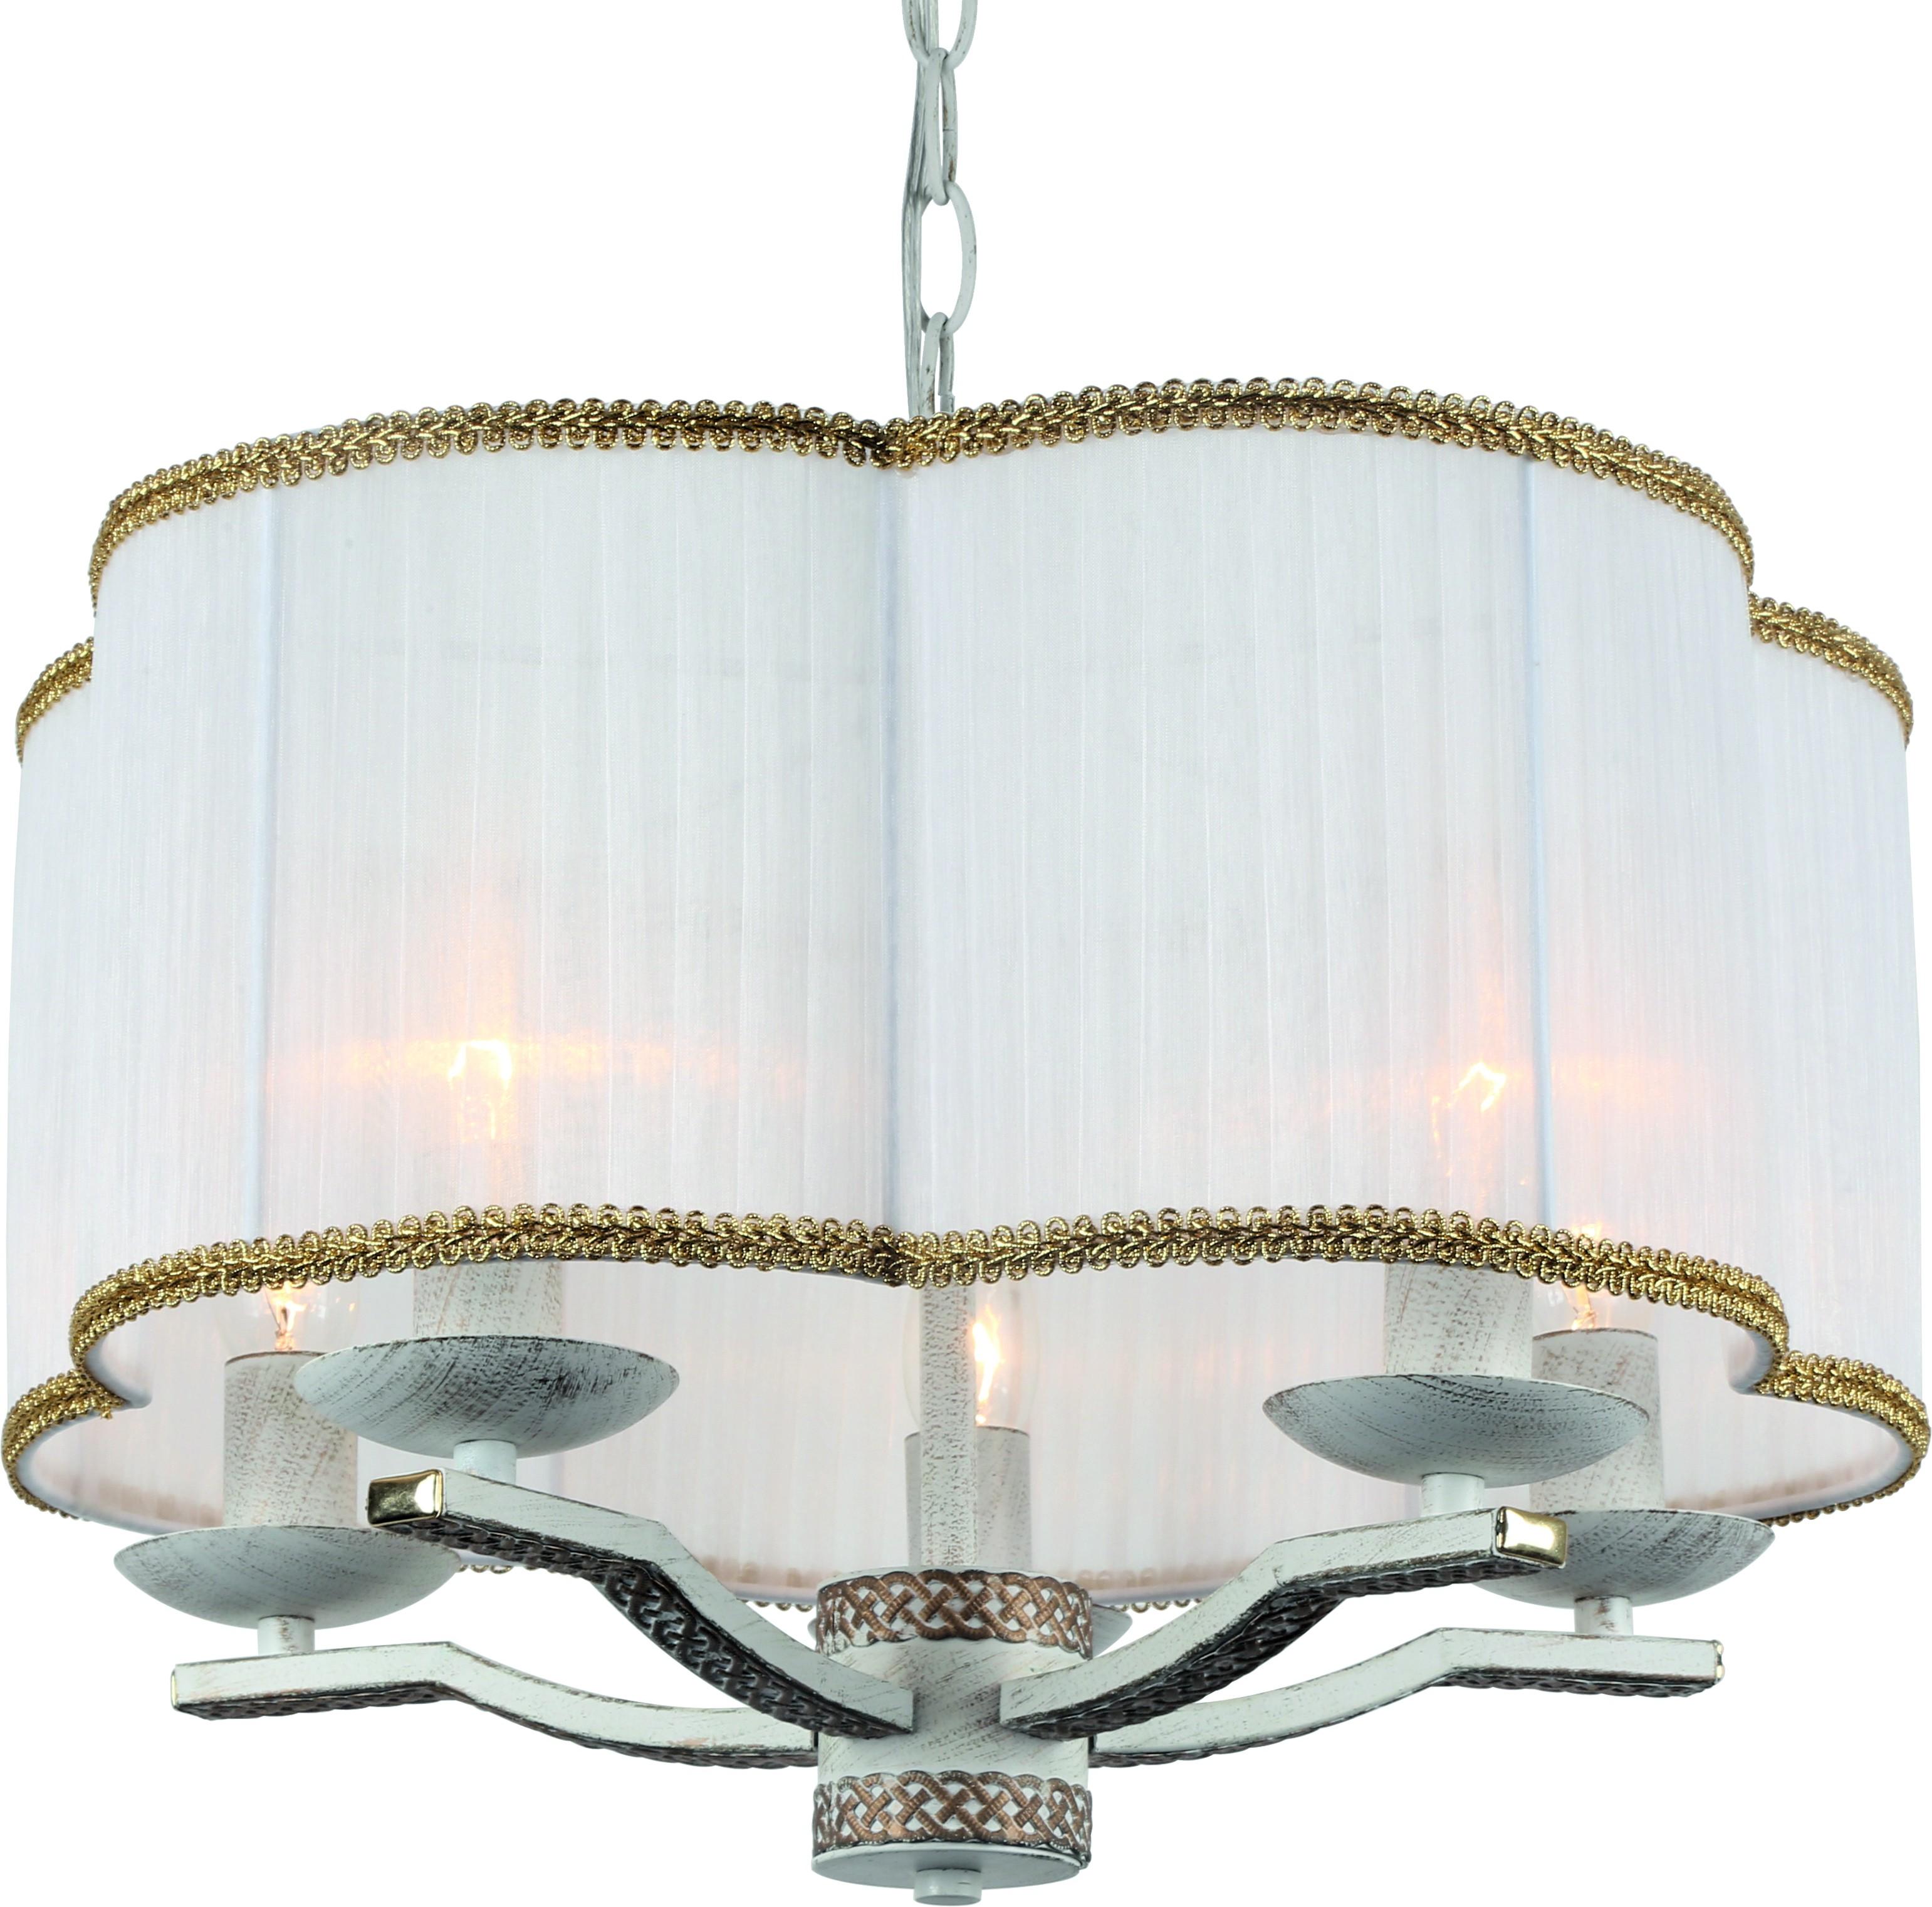 Люстра Arte lamp A6555sp-5wg подвесная люстра arte lamp a6555sp 5wg